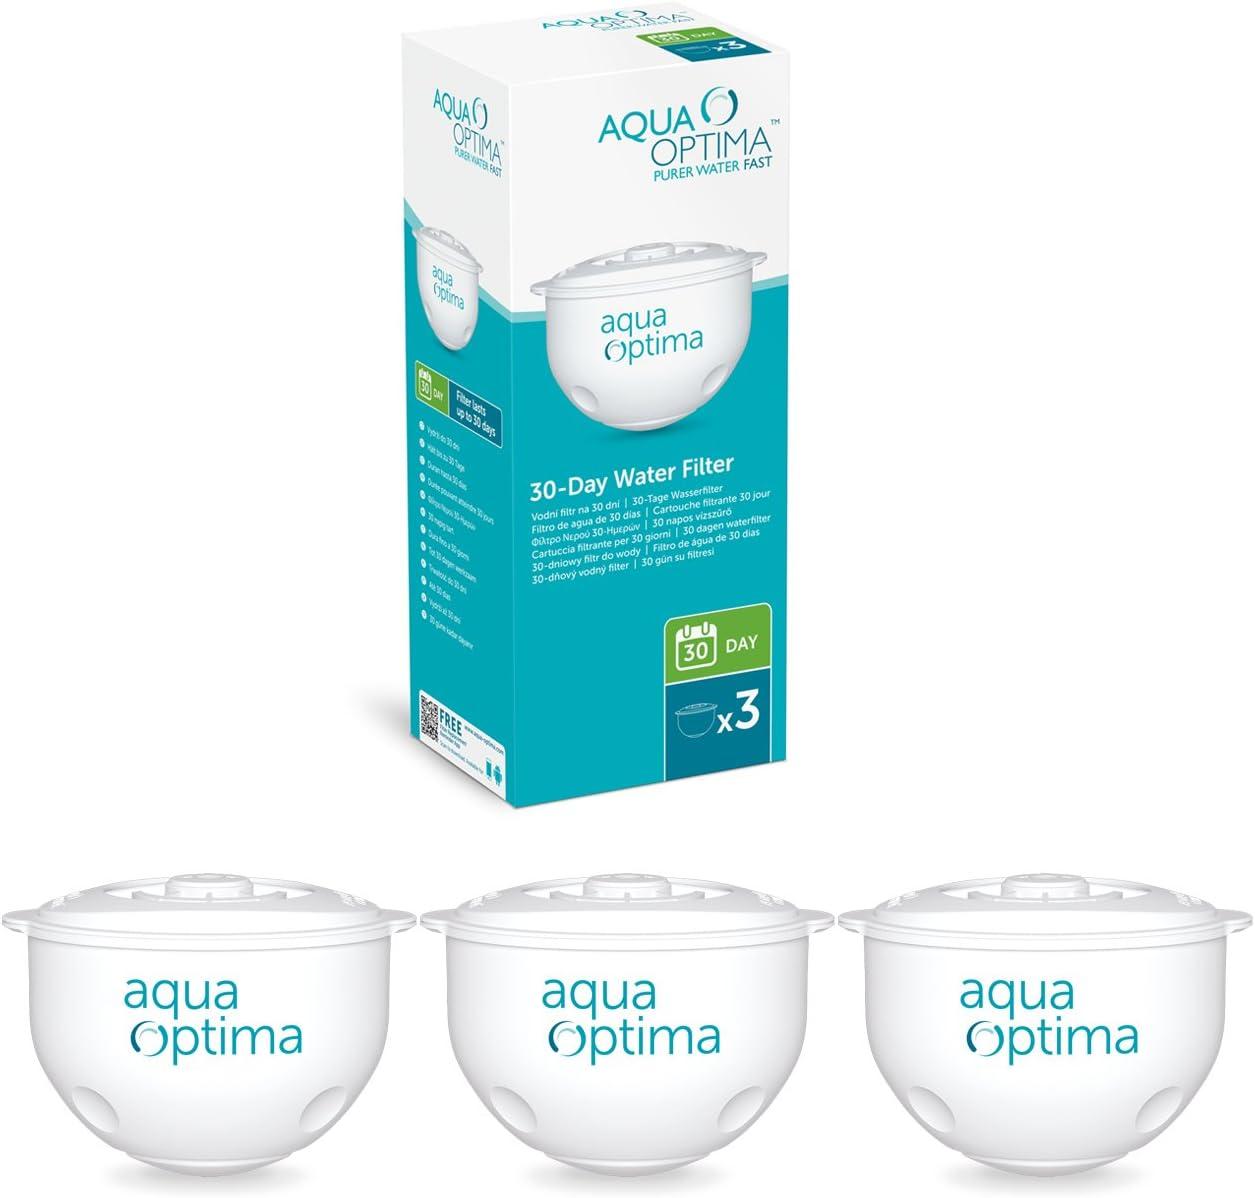 Aqua Optima LISCIA Filtre Carafe avec 1 x 30 Jour Evolve-Pack 1 mois-Blanc